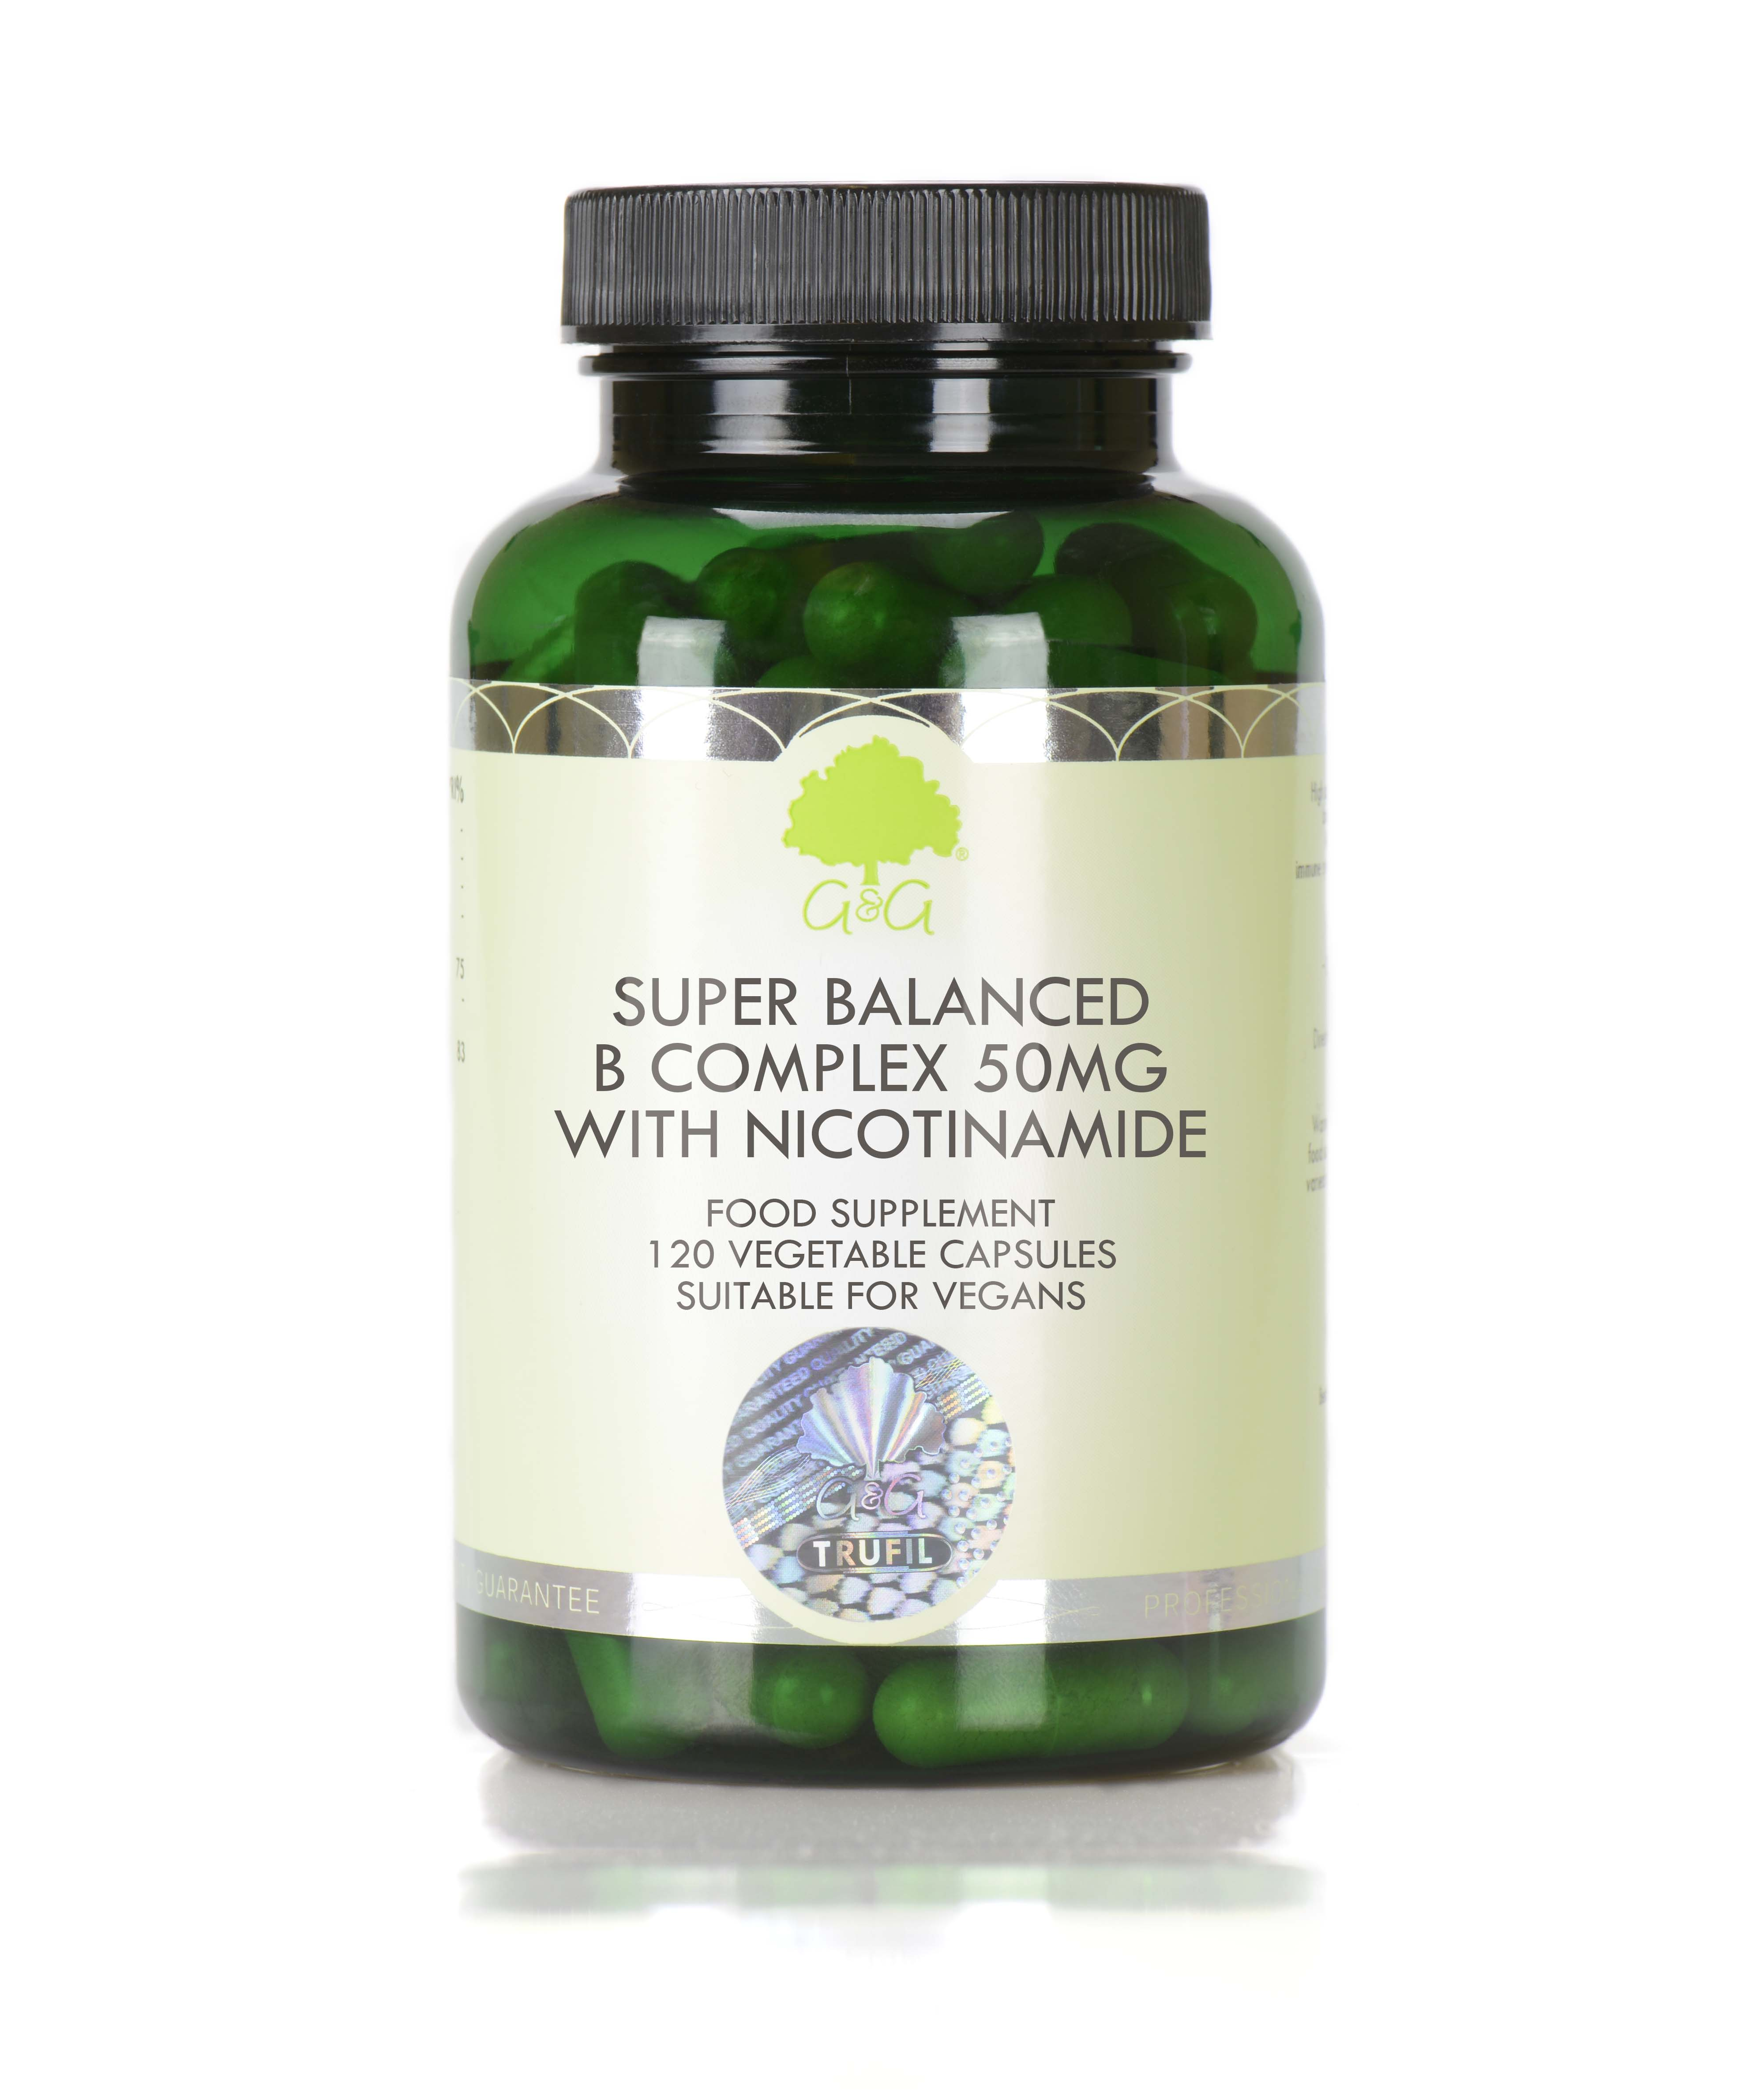 Super Balanced B Complex 50mg with Nicotinamide 120's